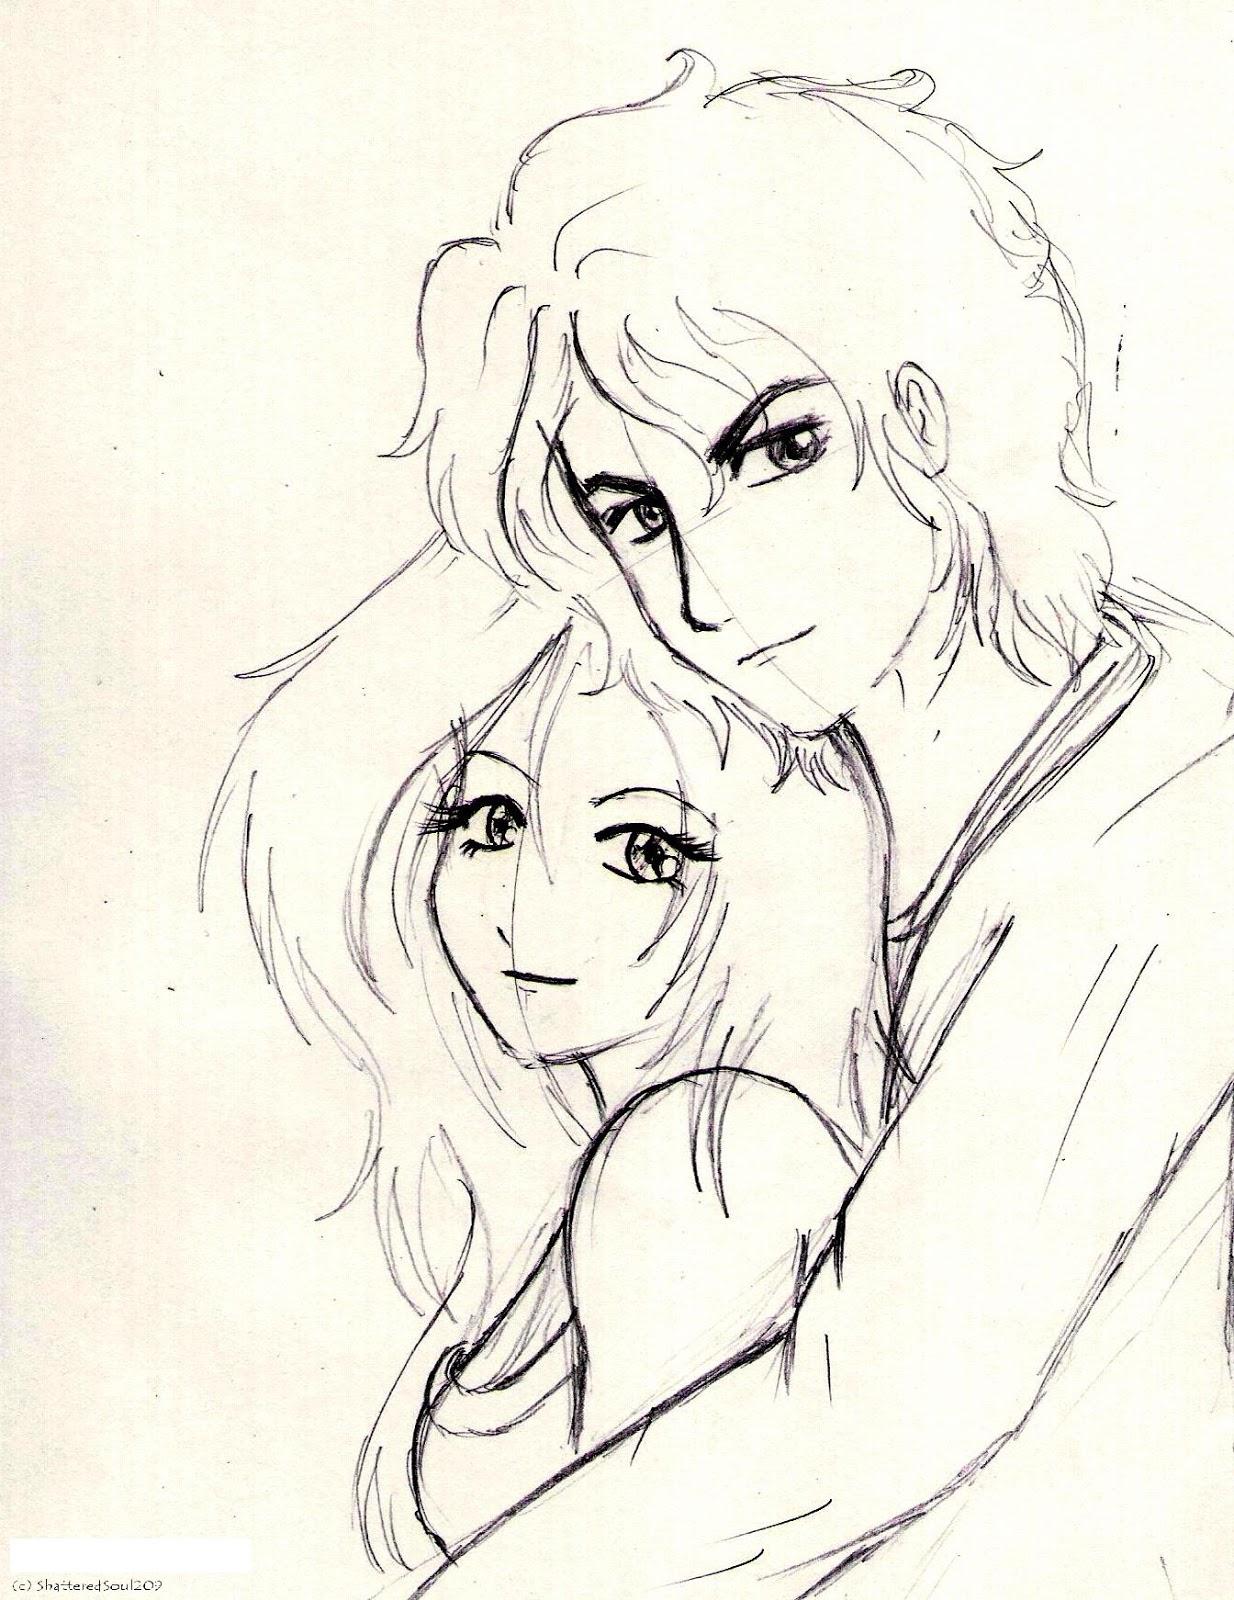 1234x1600 Romantic Anime Drawing Romantic Anime Drawings Drawing Anime